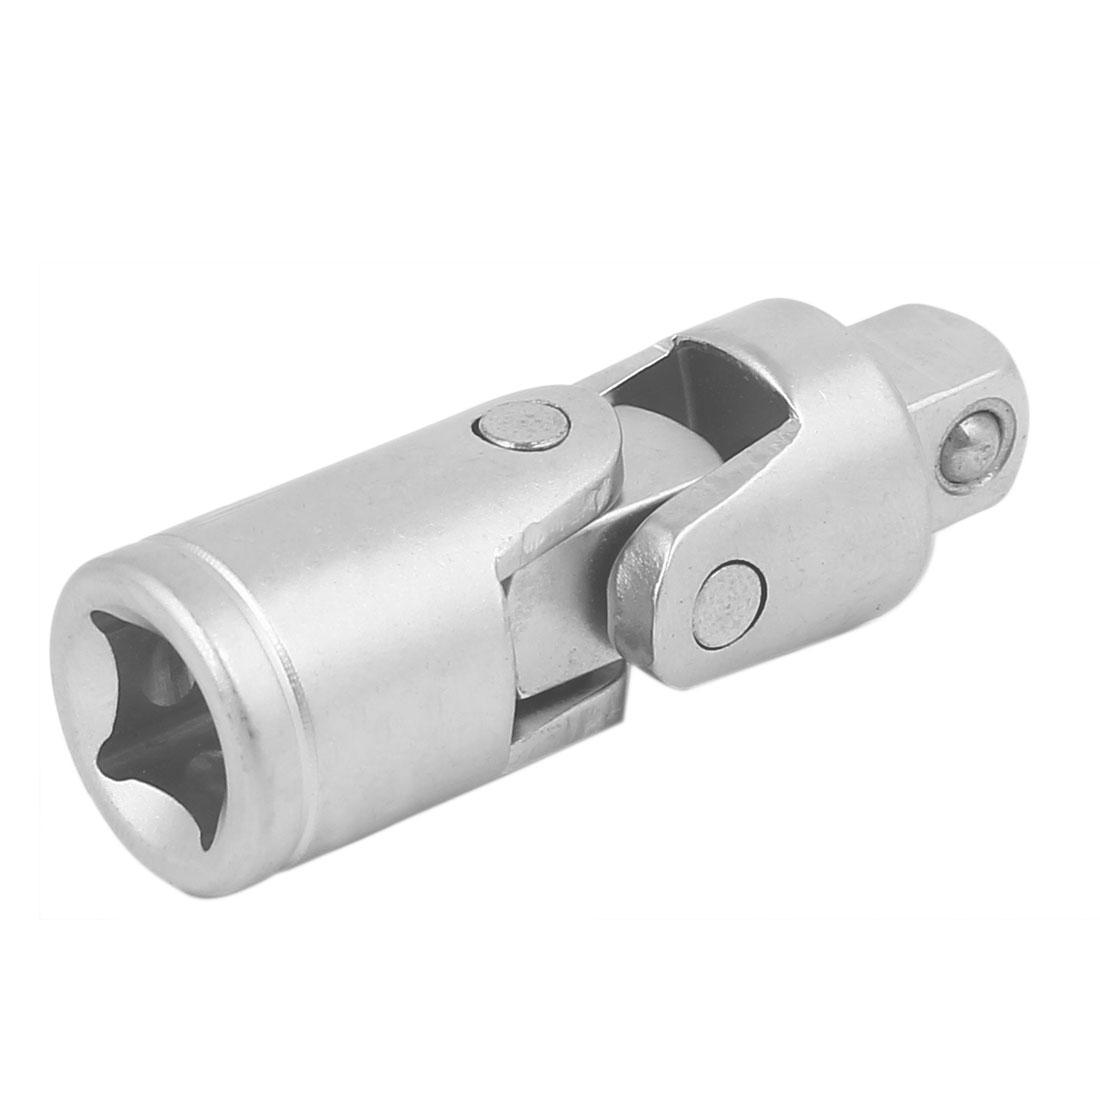 "3/8"" Square Driver Chrome Vanadium Steel 90 Degree Universal Joint Swivel Socket"